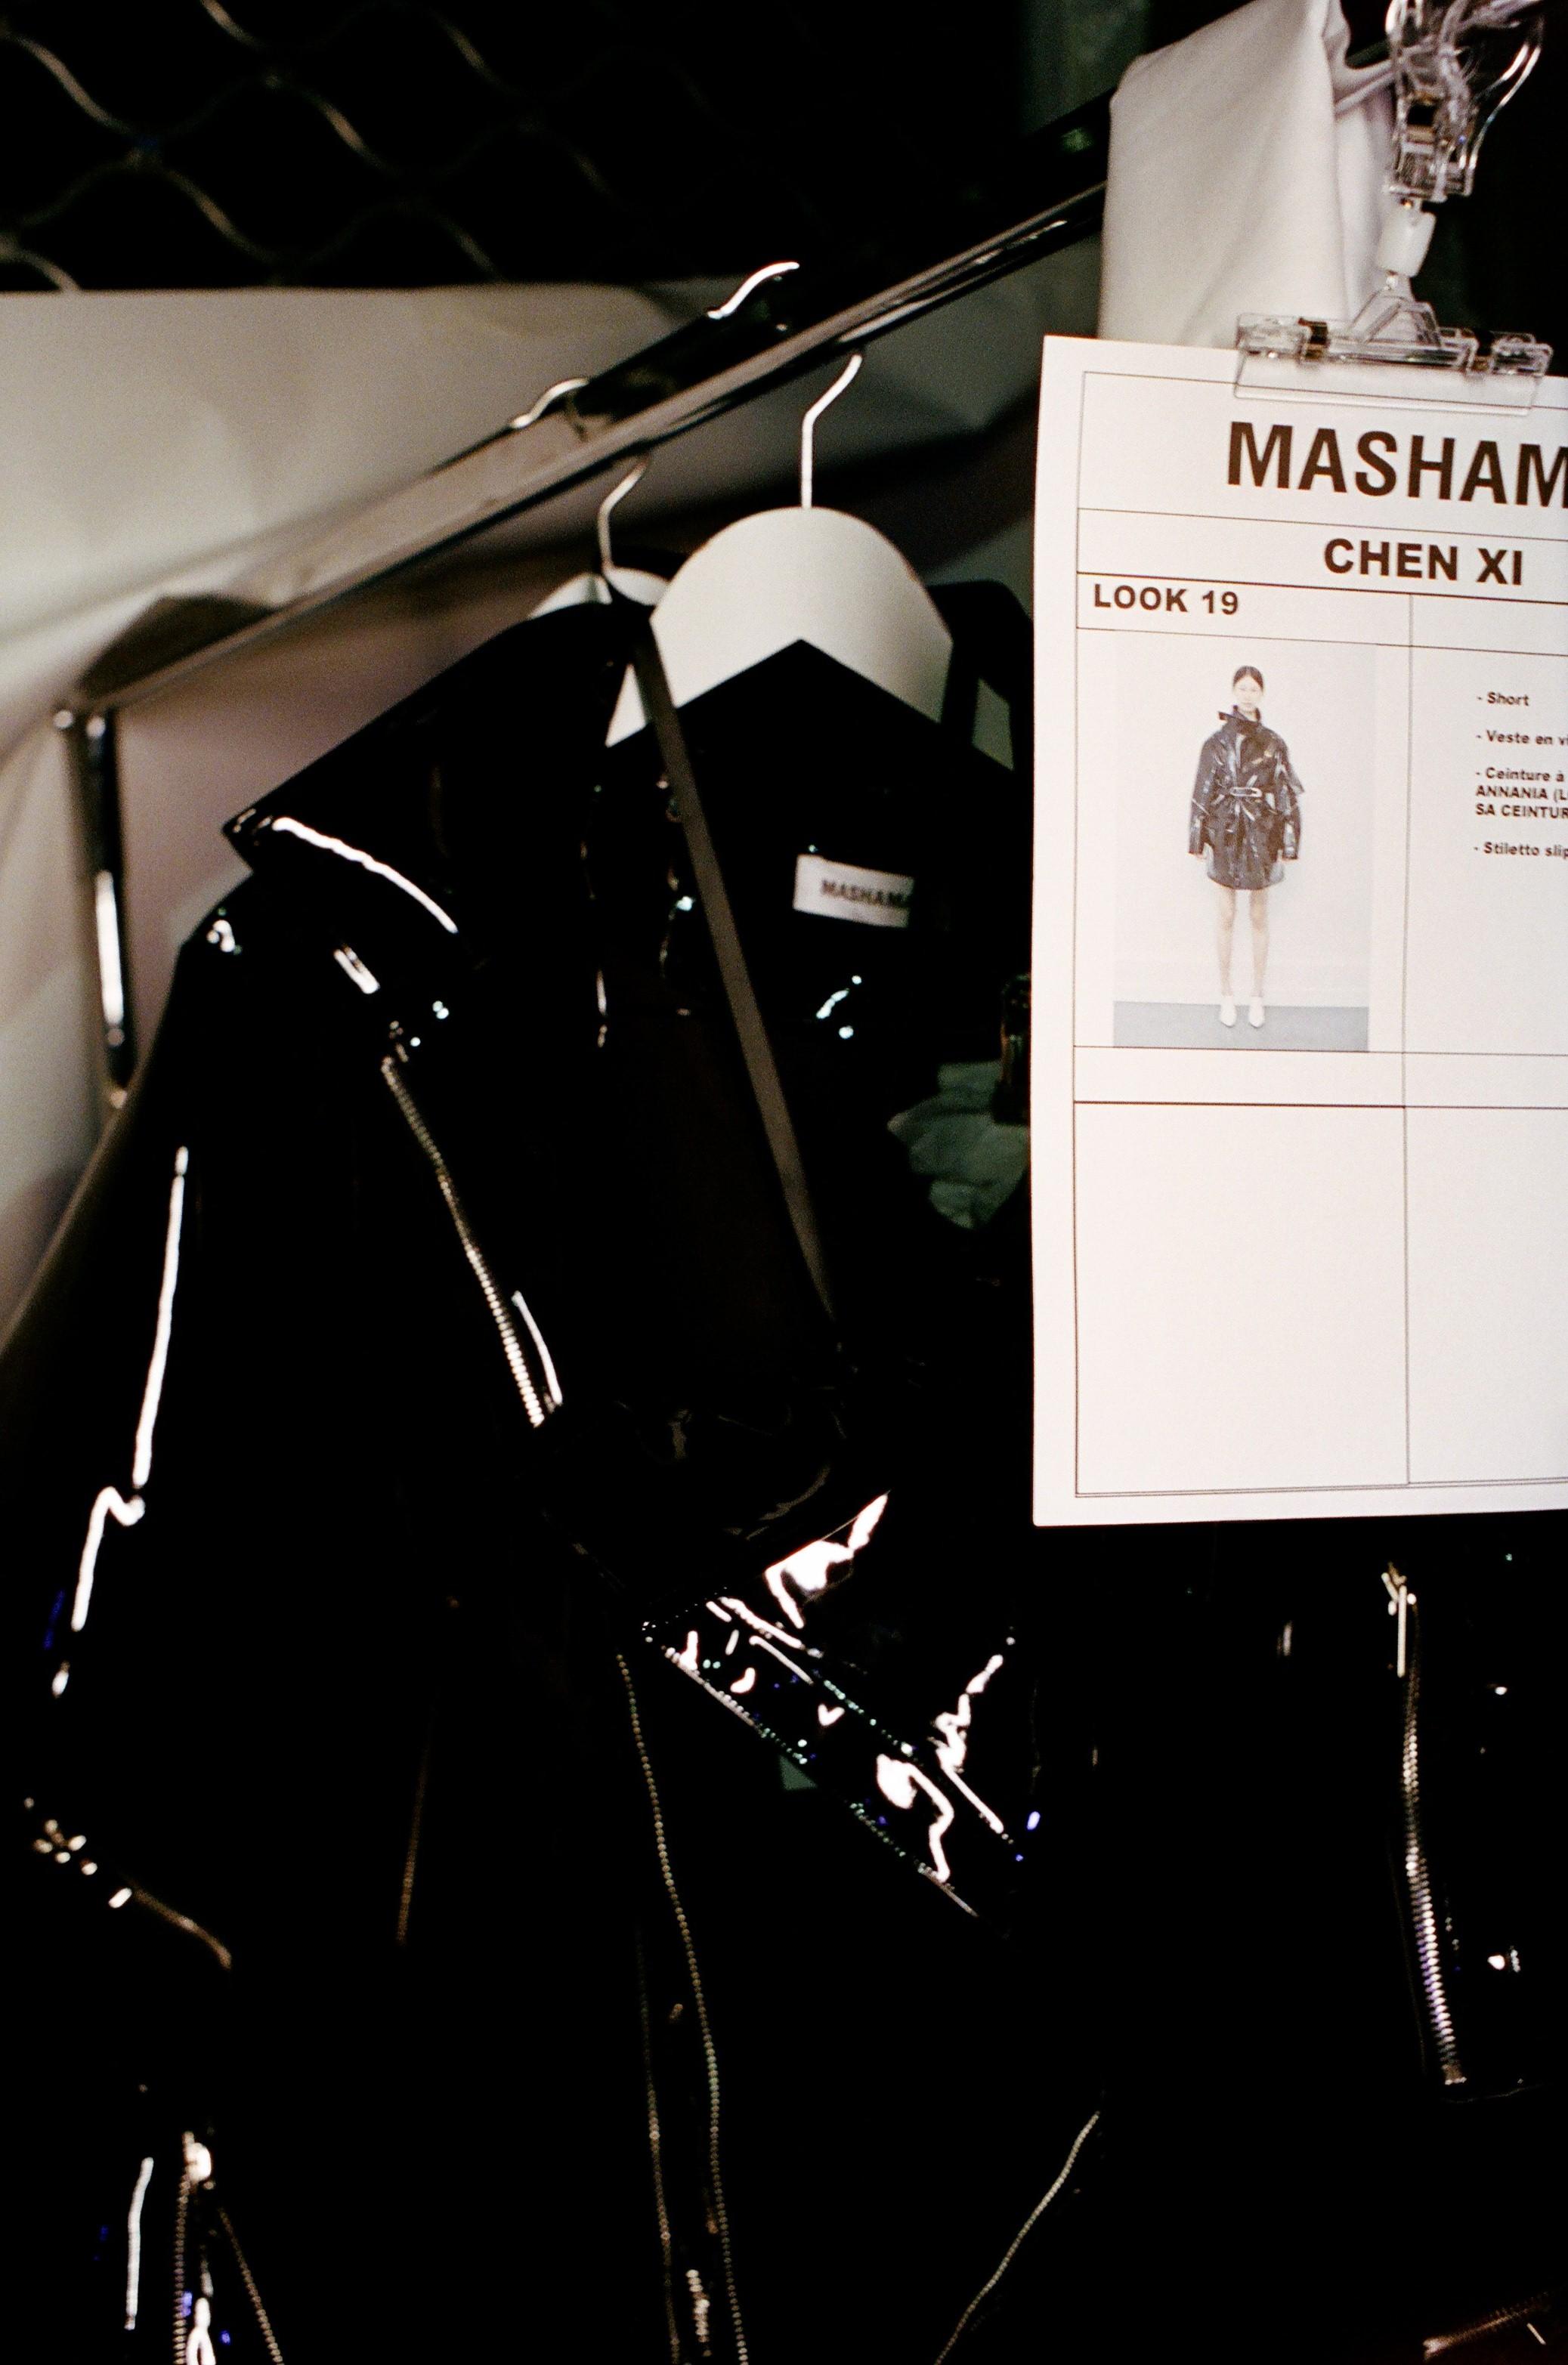 MASHAMA_HONIGSCHRECK_ANALOG (43).JPG